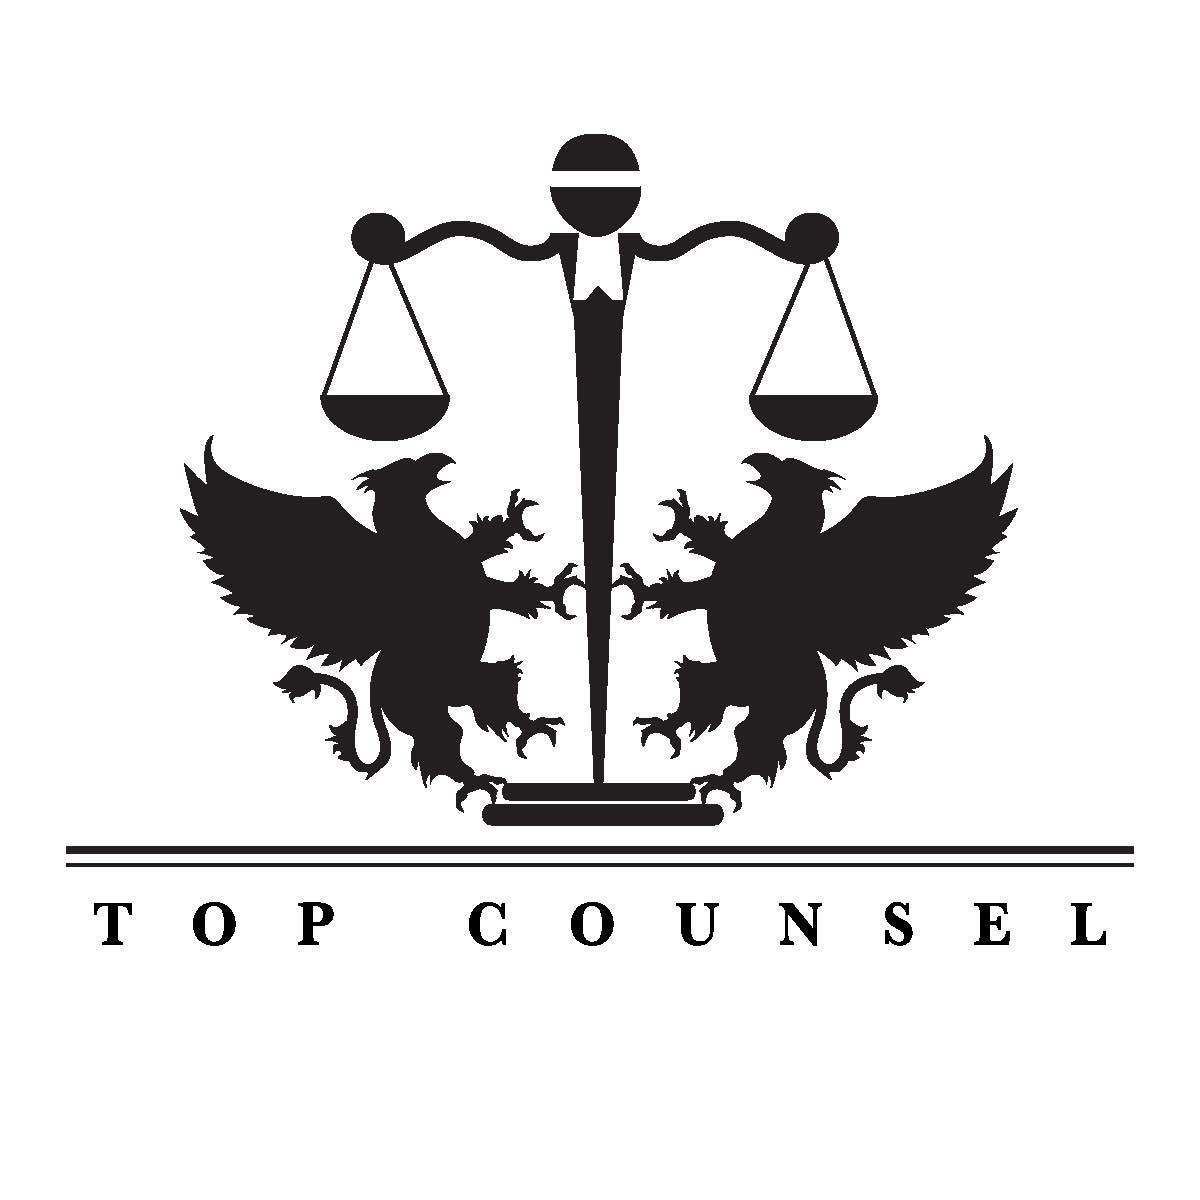 TOPCOUNSEL.COM